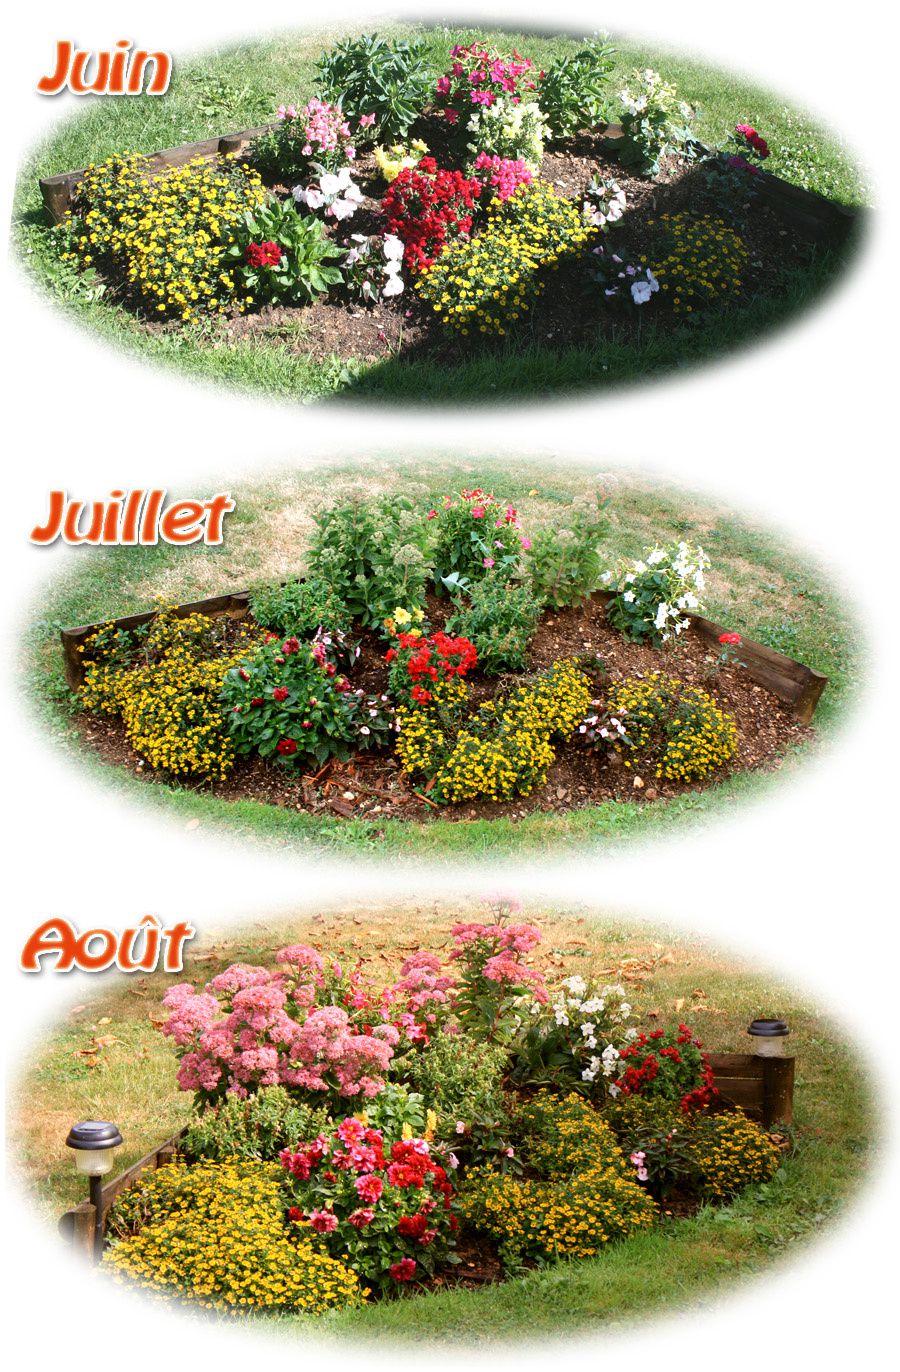 Fleurs jardin le blog de philippe - Massif fleuri toute l annee ...